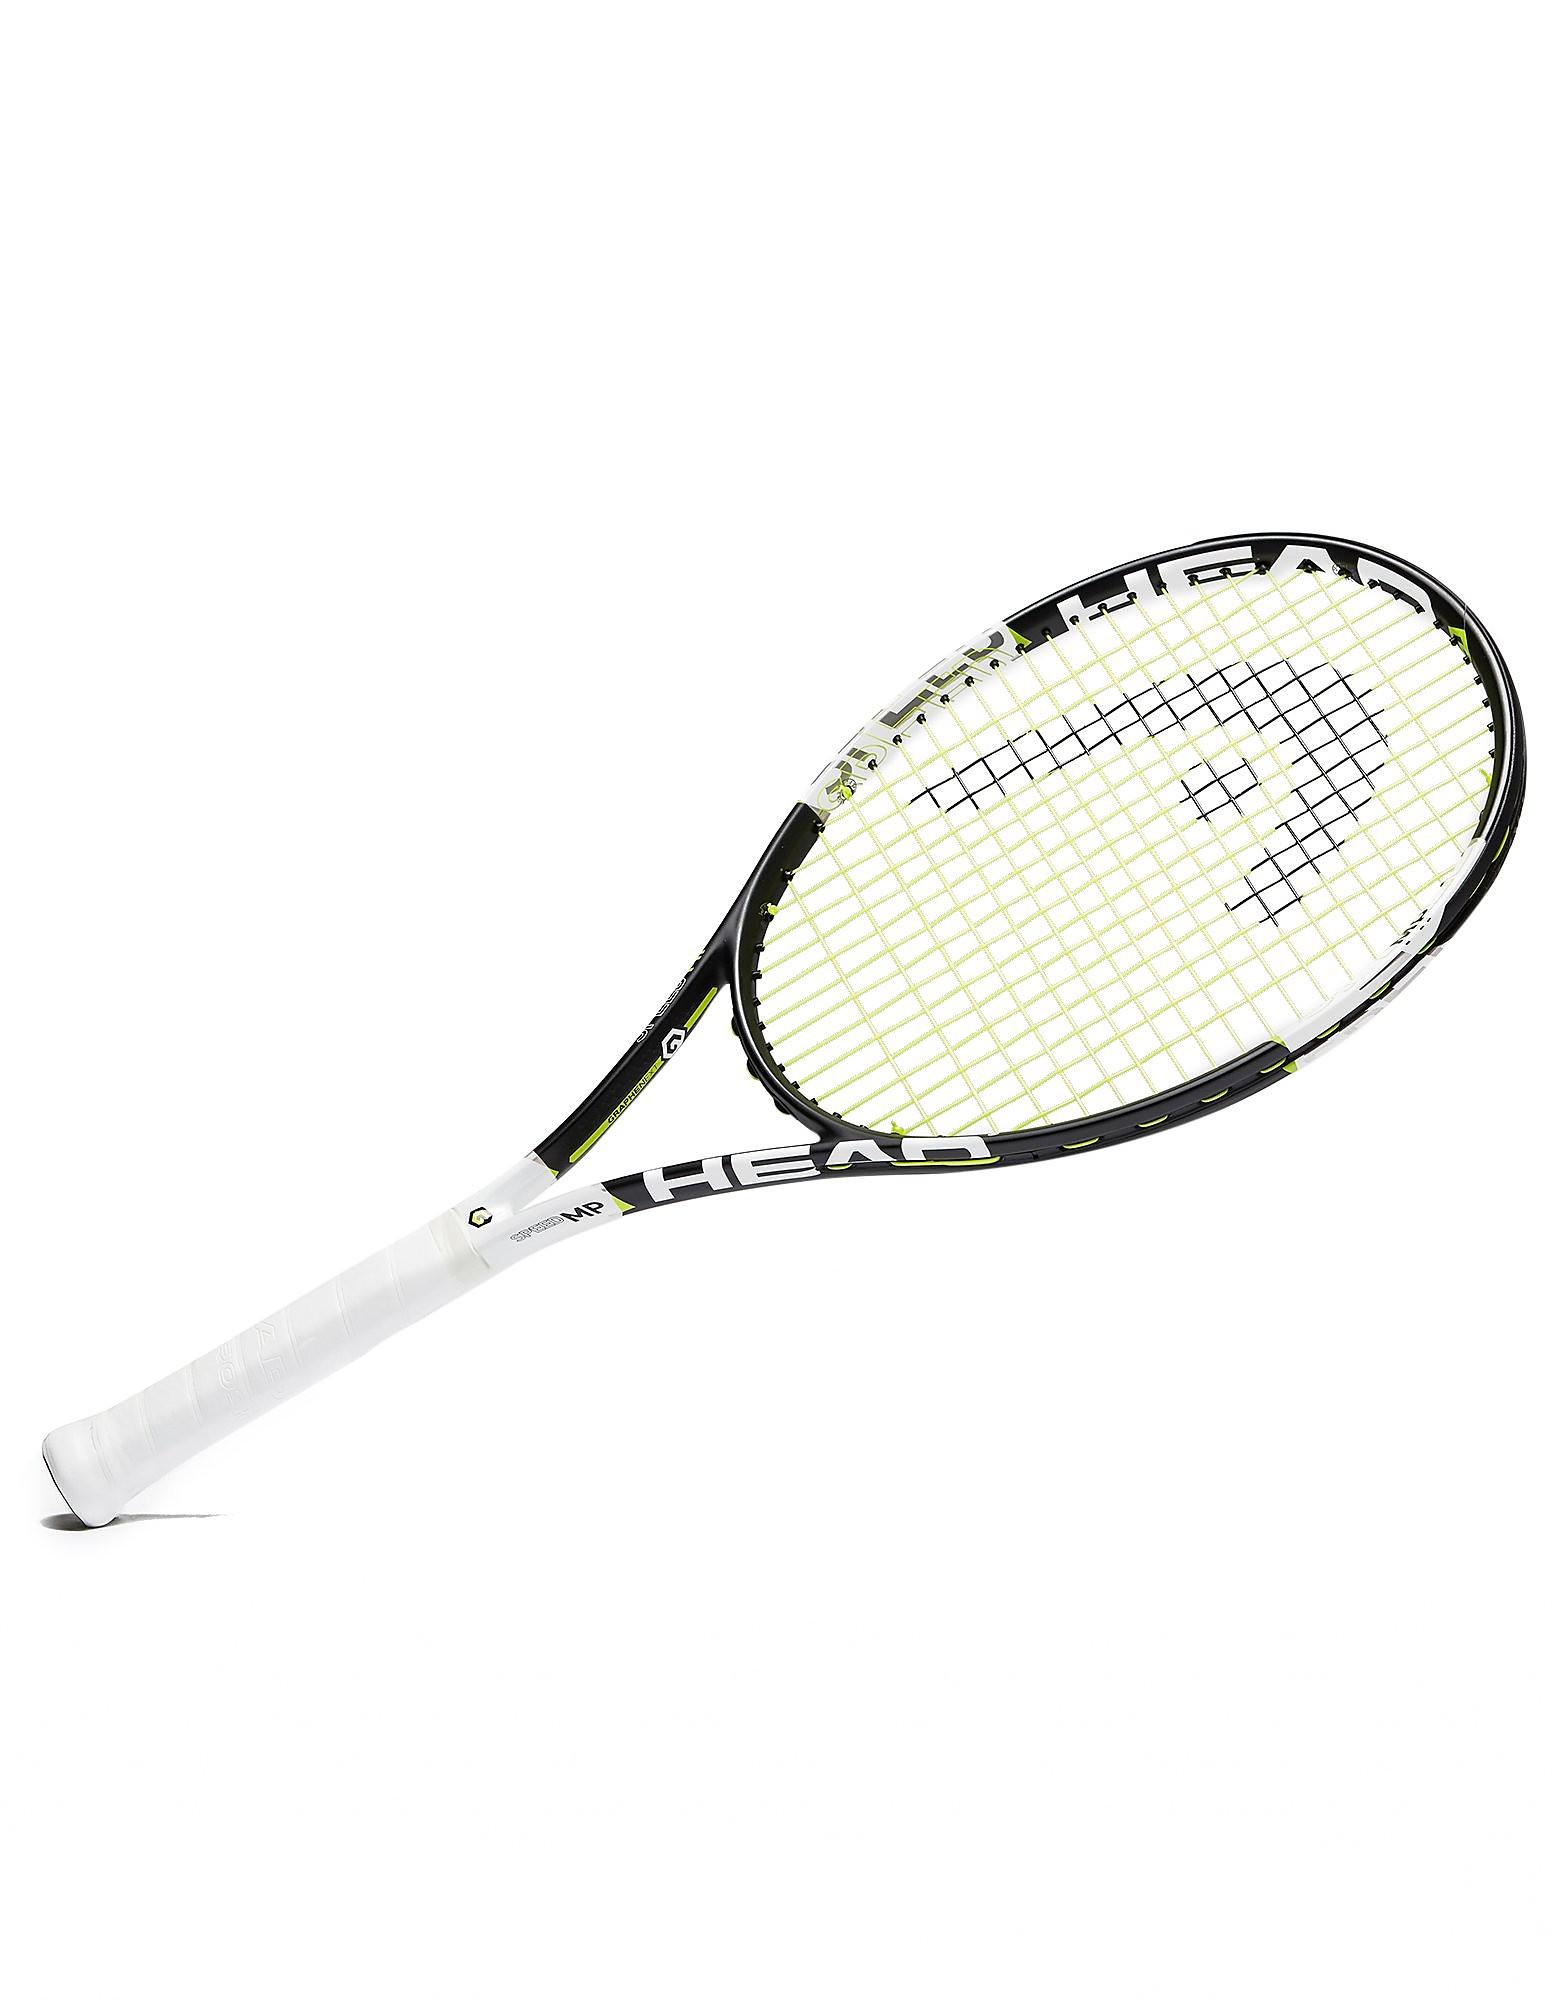 Head Graphene Speed Tennis Racket